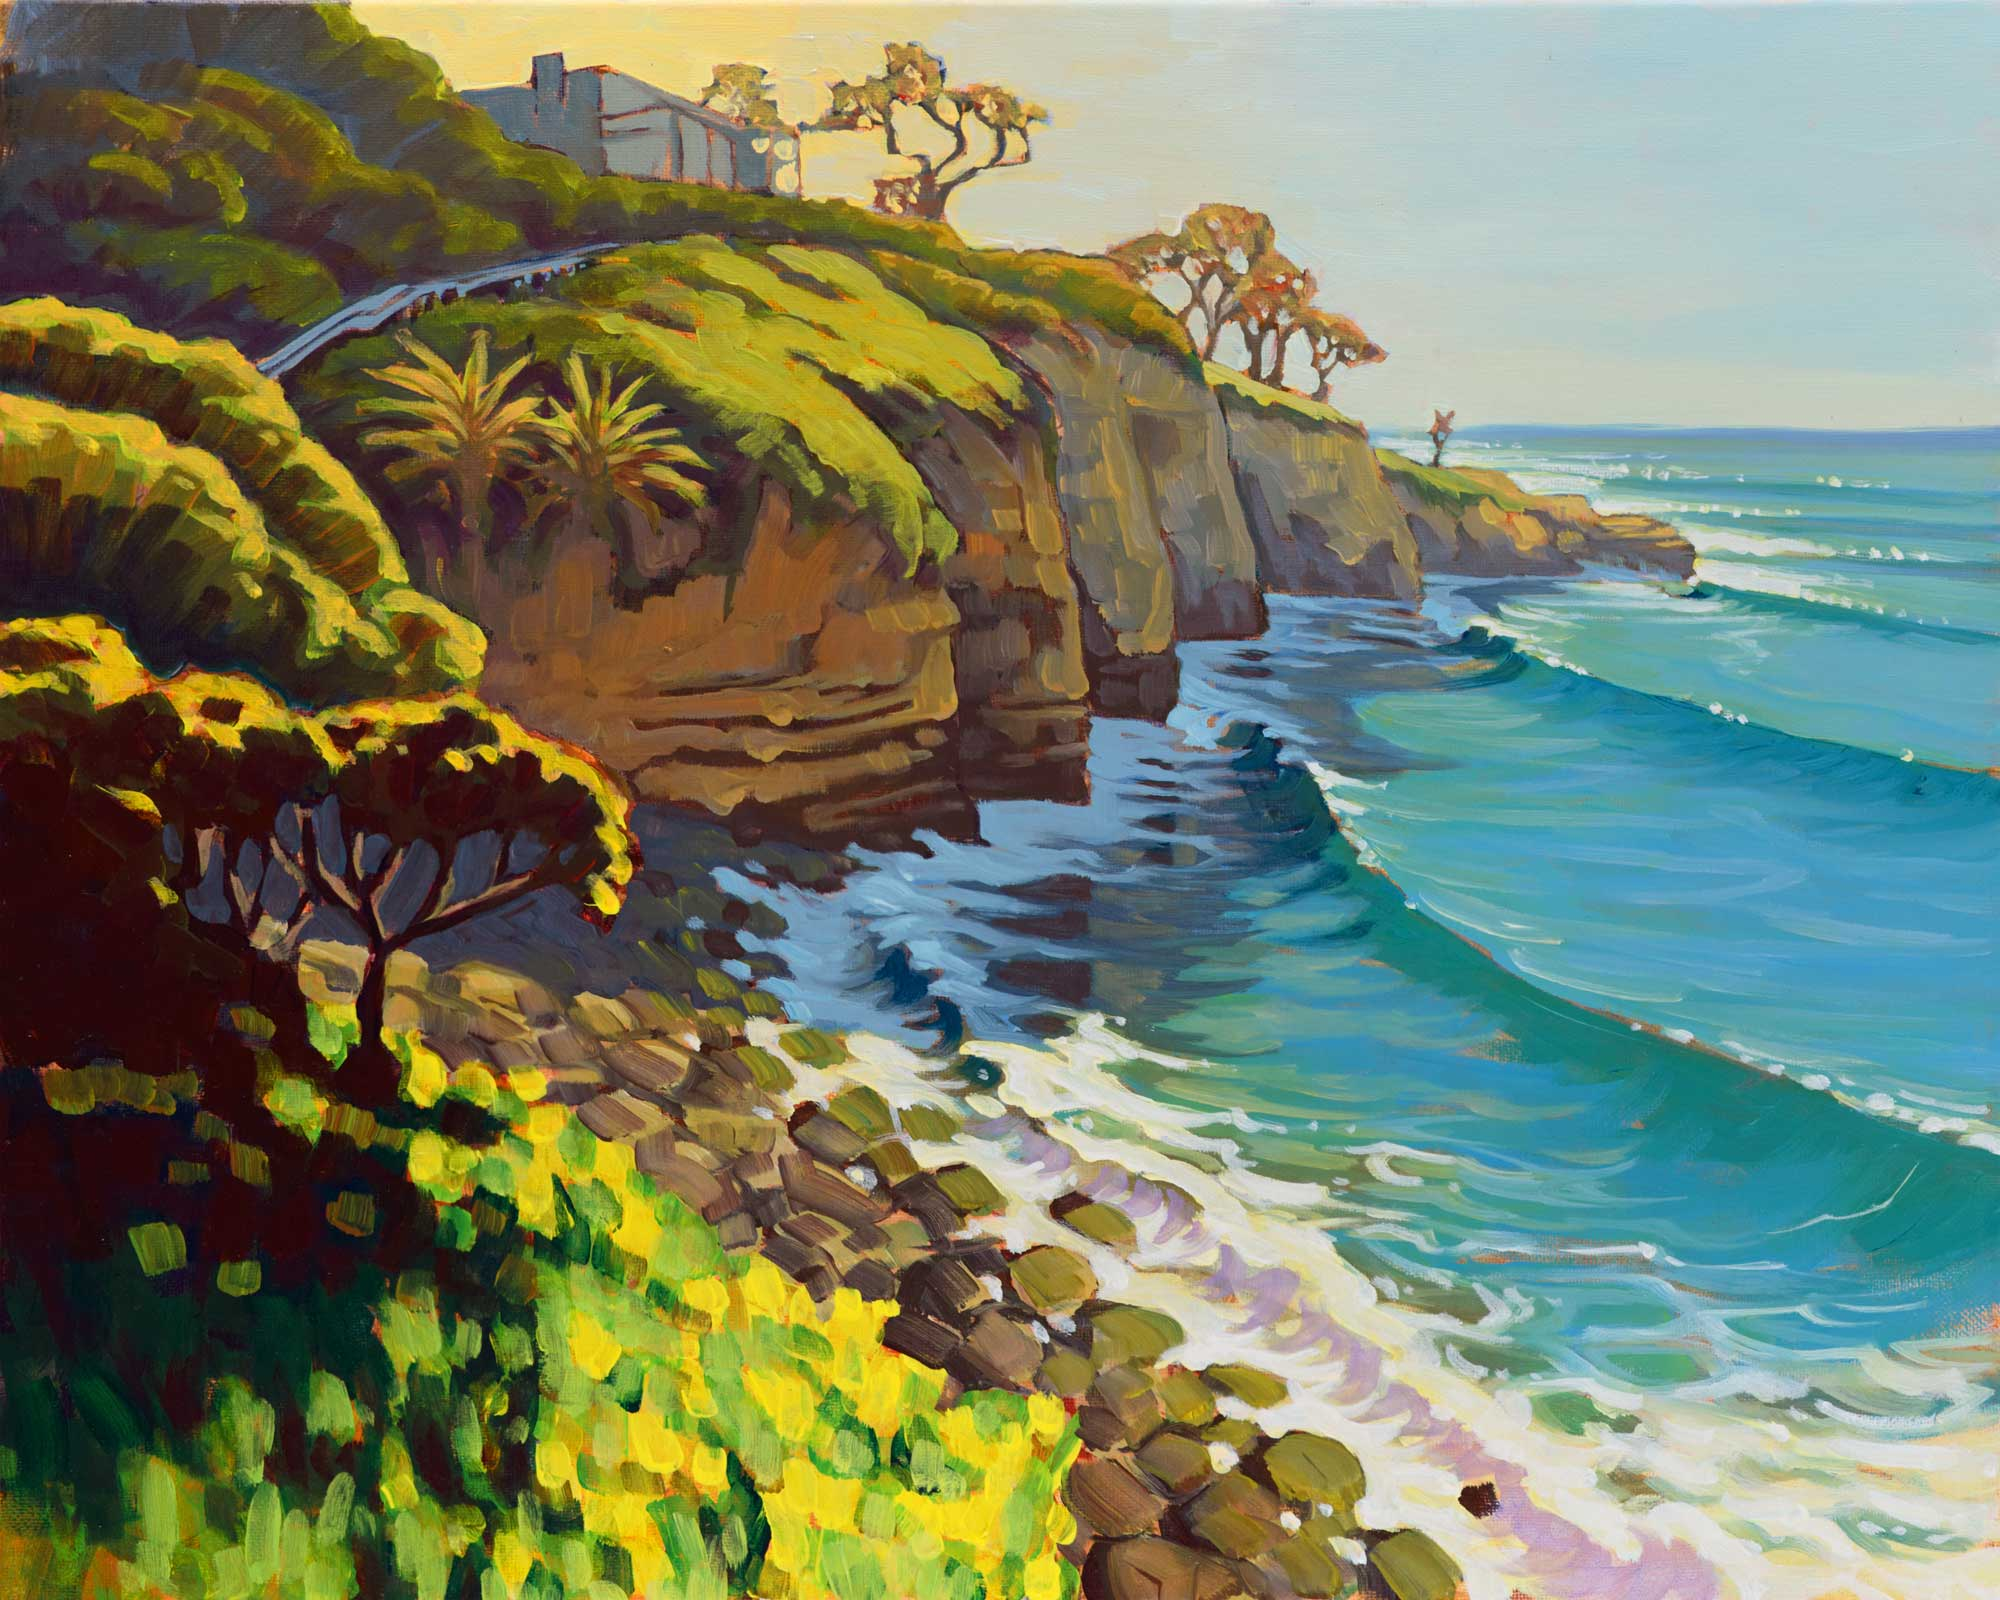 Plein air artwork from La Jolla cove on the San Diego coast of Southern California